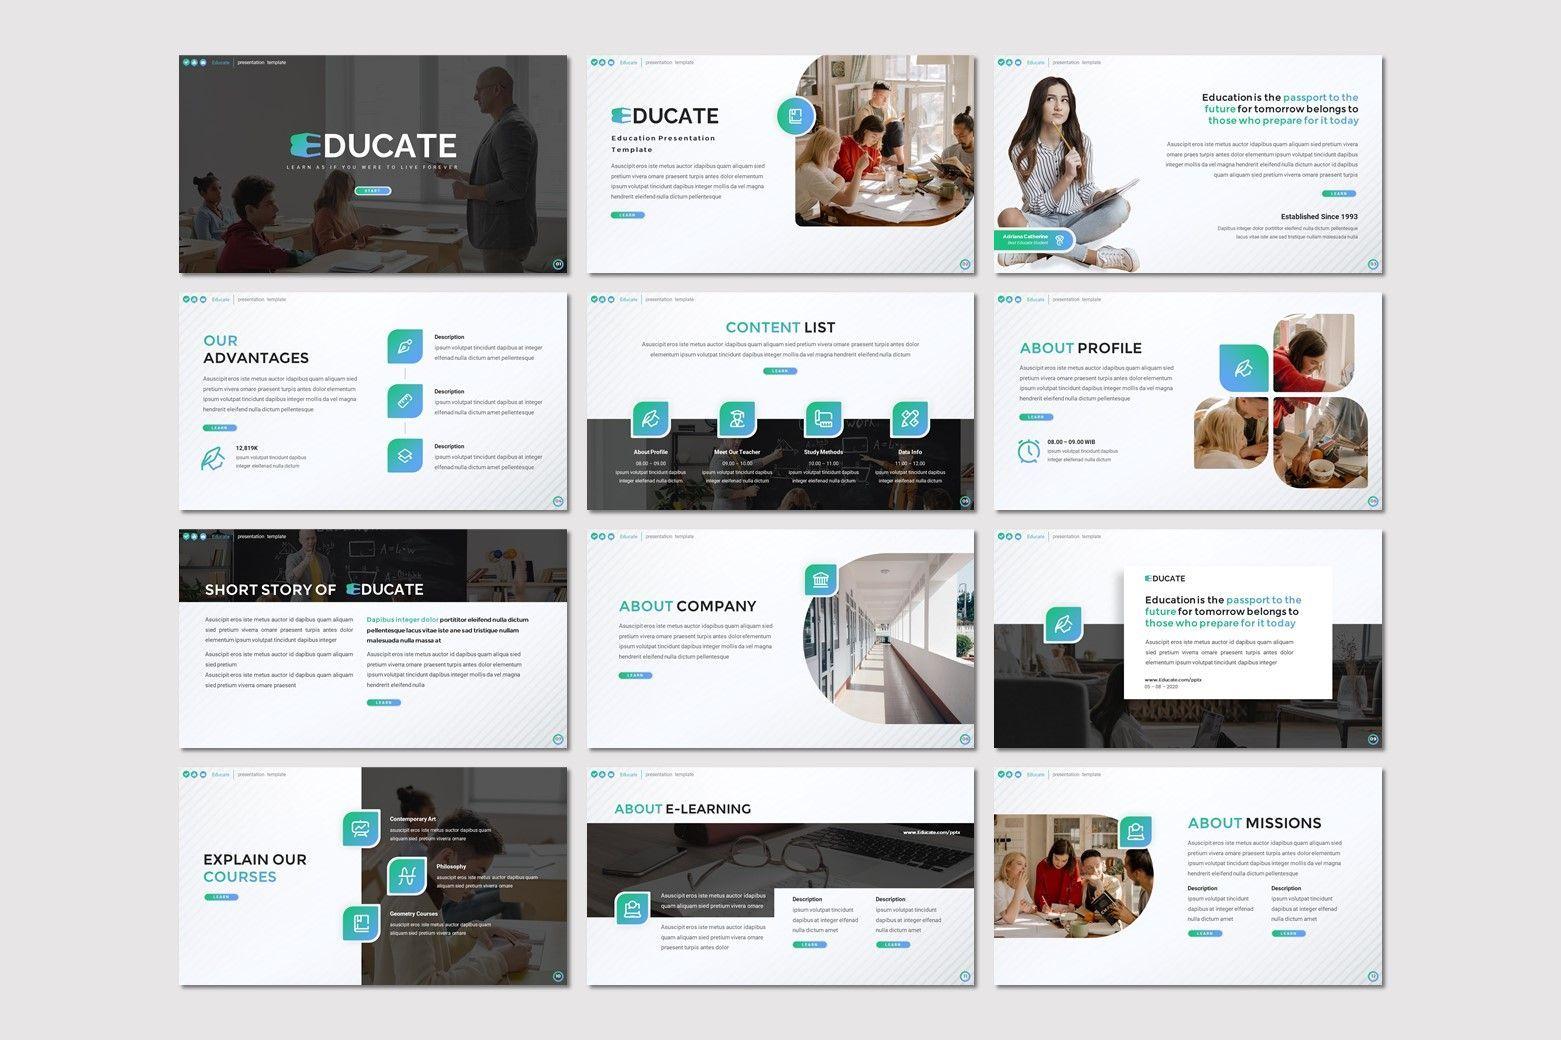 Educate - Google Slides Template, Slide 2, 08052, Presentation Templates — PoweredTemplate.com